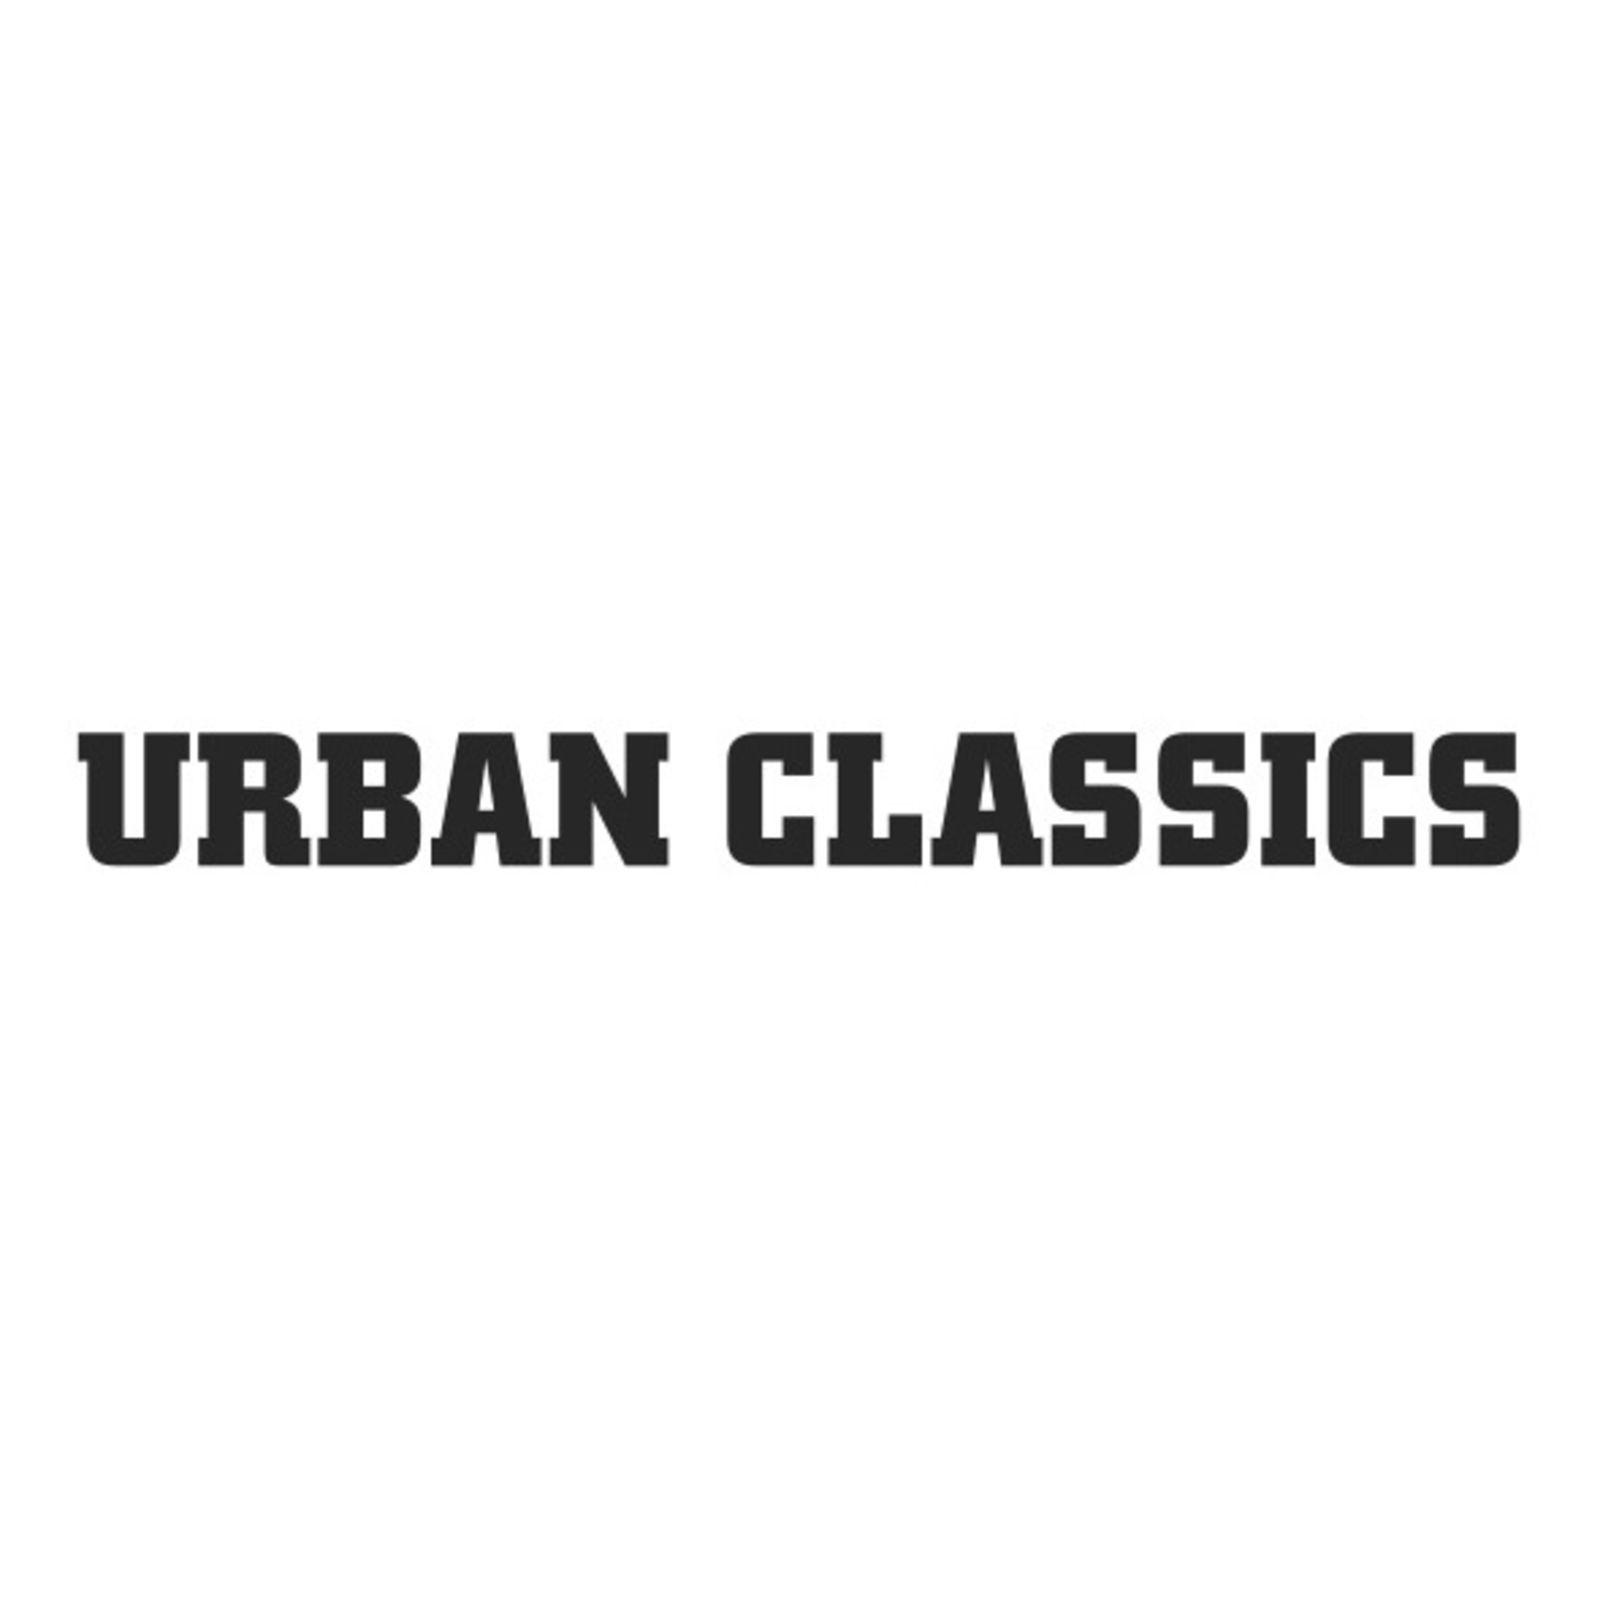 URBAN CLASSICS (Bild 1)